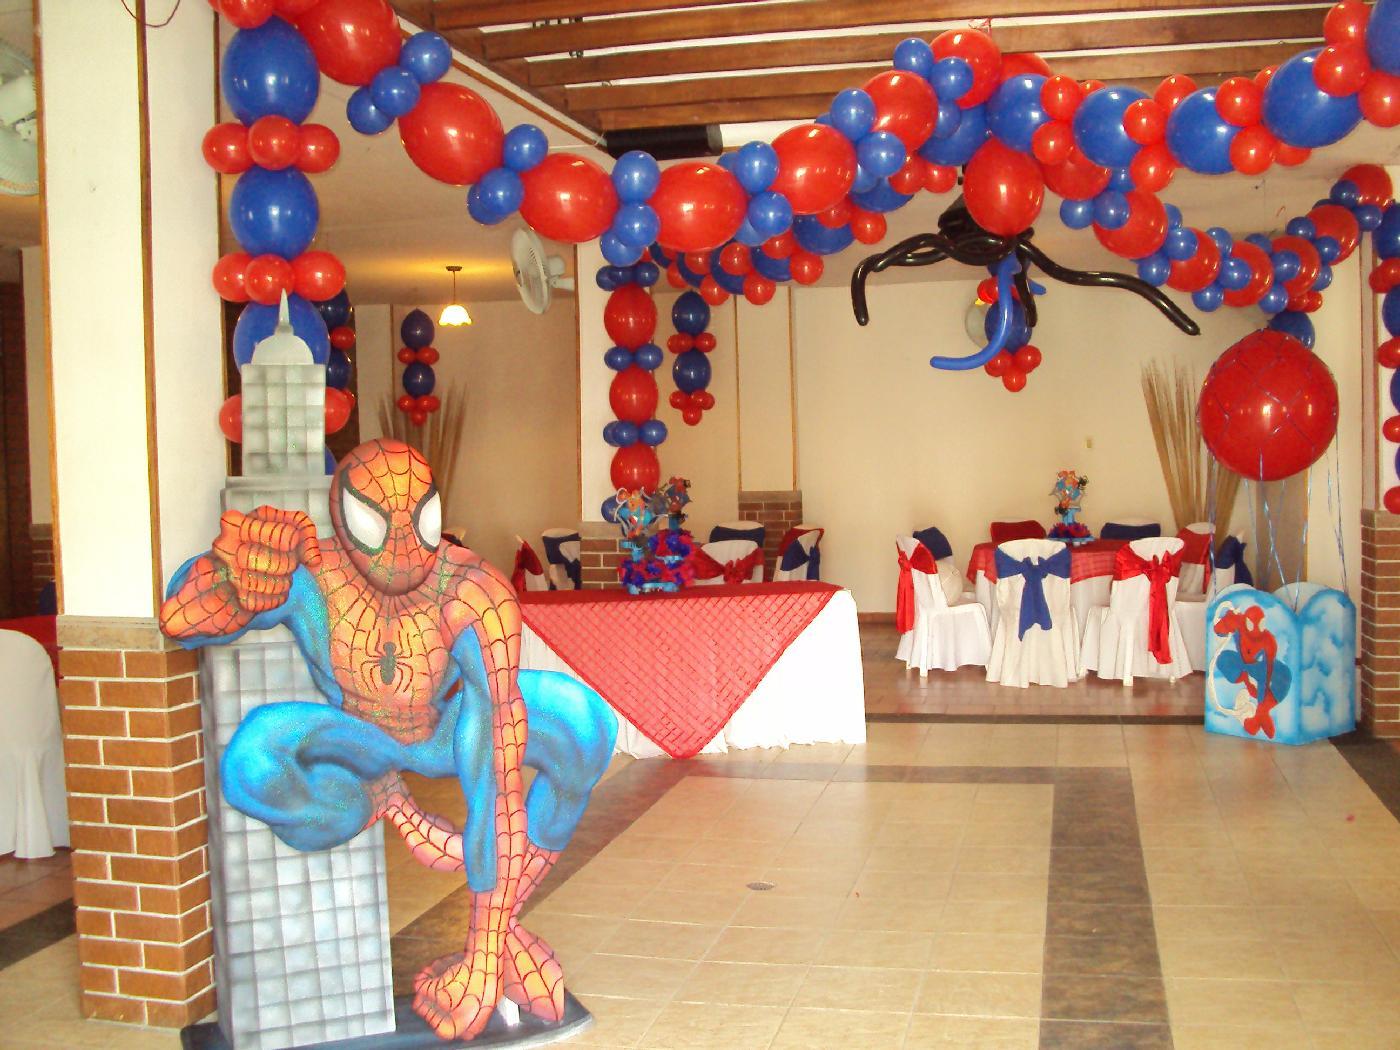 Fiestas de mickey mouse auto design tech - Decoracion fiestas infantiles ...